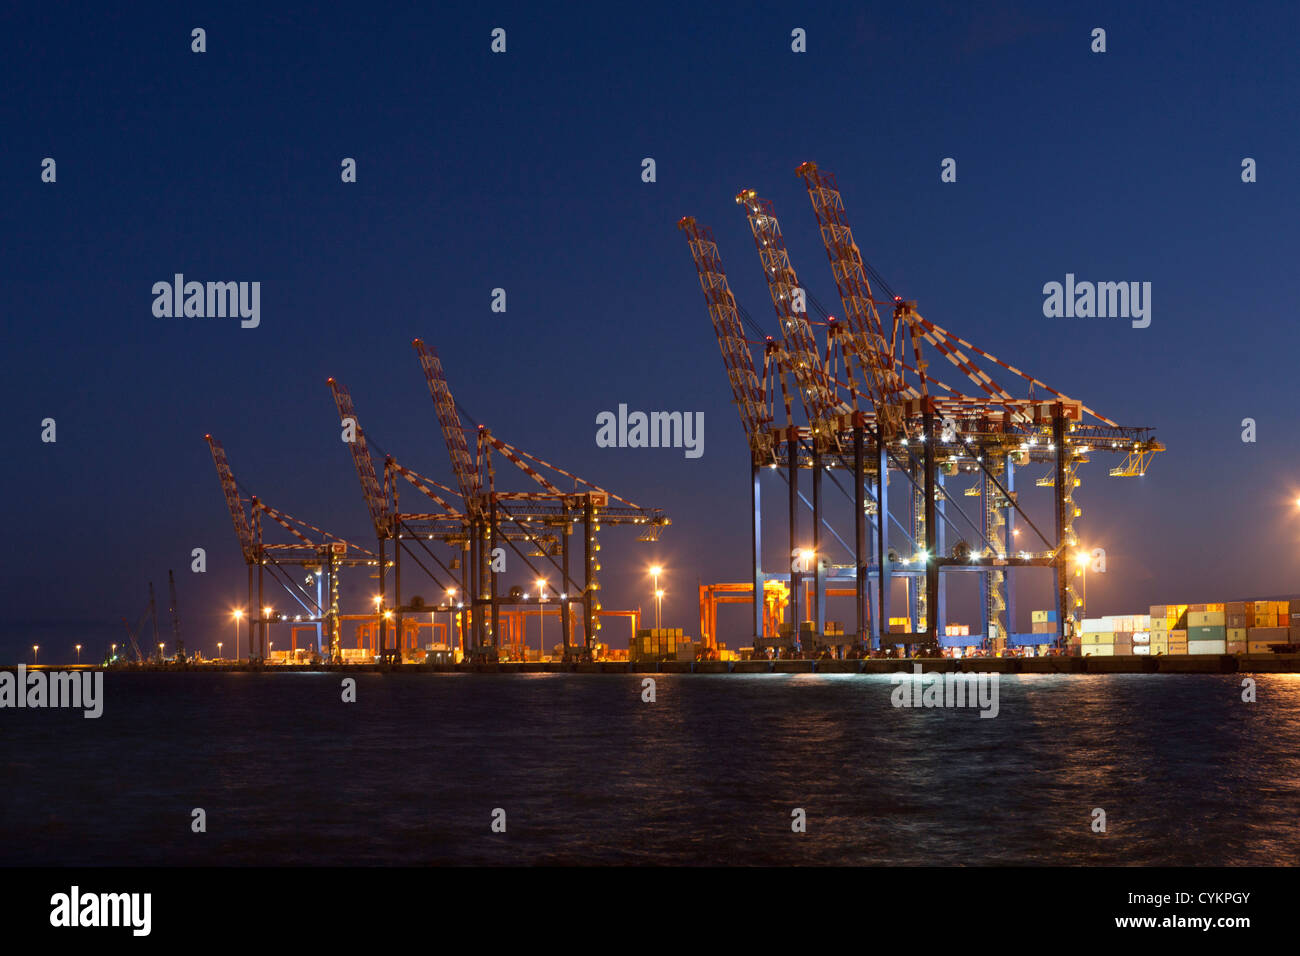 Cranes in shipyard lit up at night - Stock Image